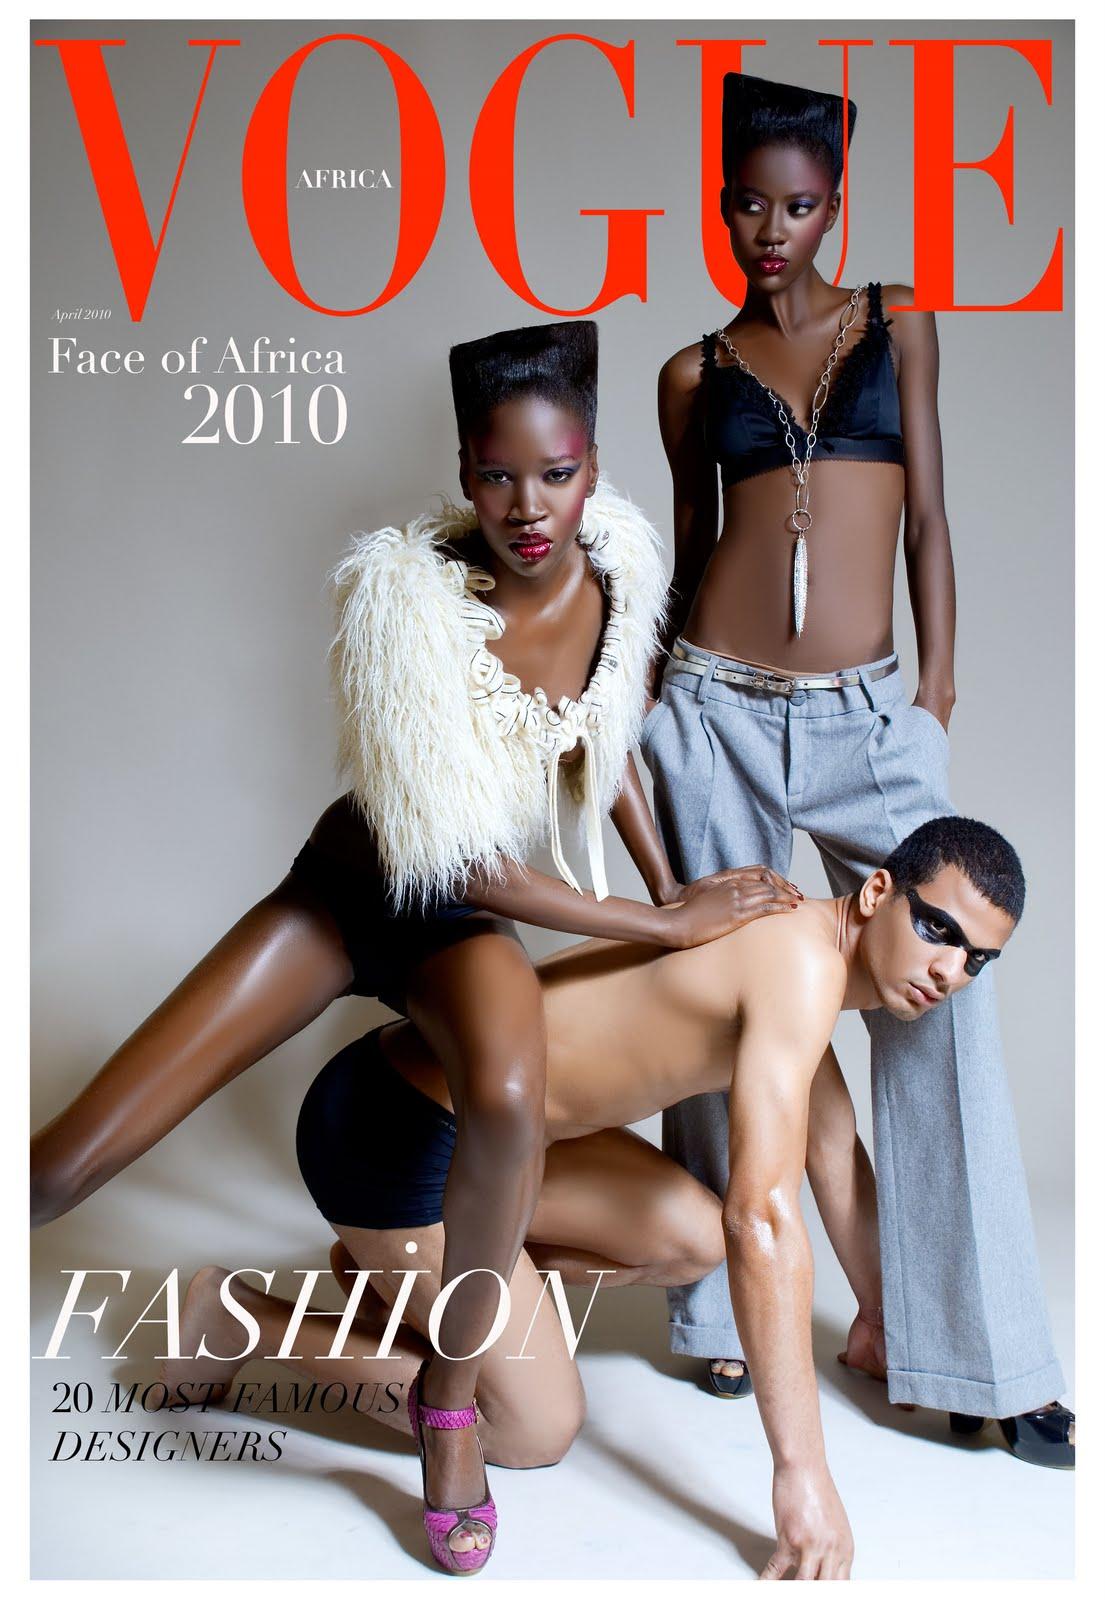 Vogue%2BAfrica%2B6 Adriana Lima hot XXX adult